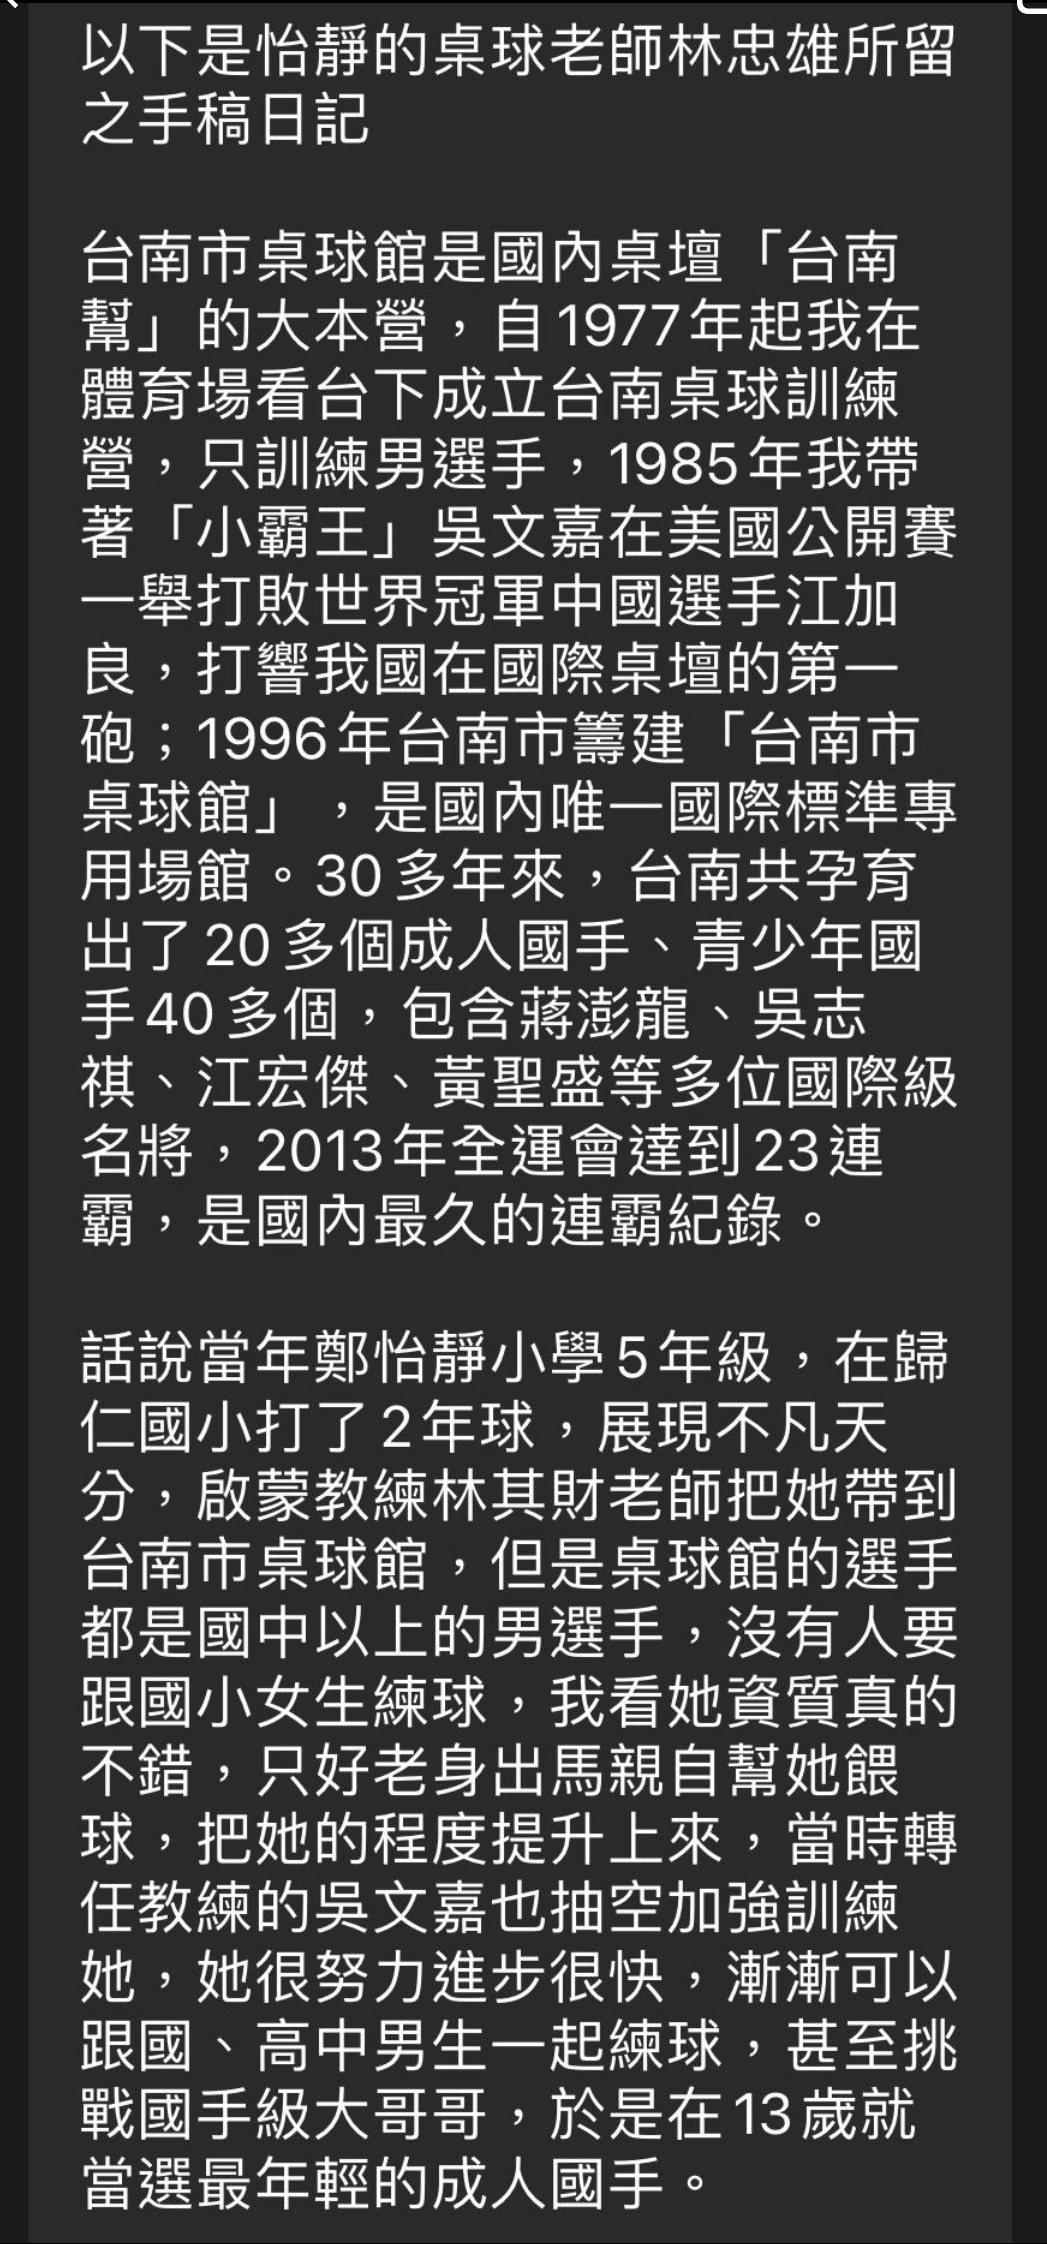 PTT昨晚有人爆料「台南市府剝奪桌球資源 逼鄭怡靜轉籍北市」。圖/取自PTT